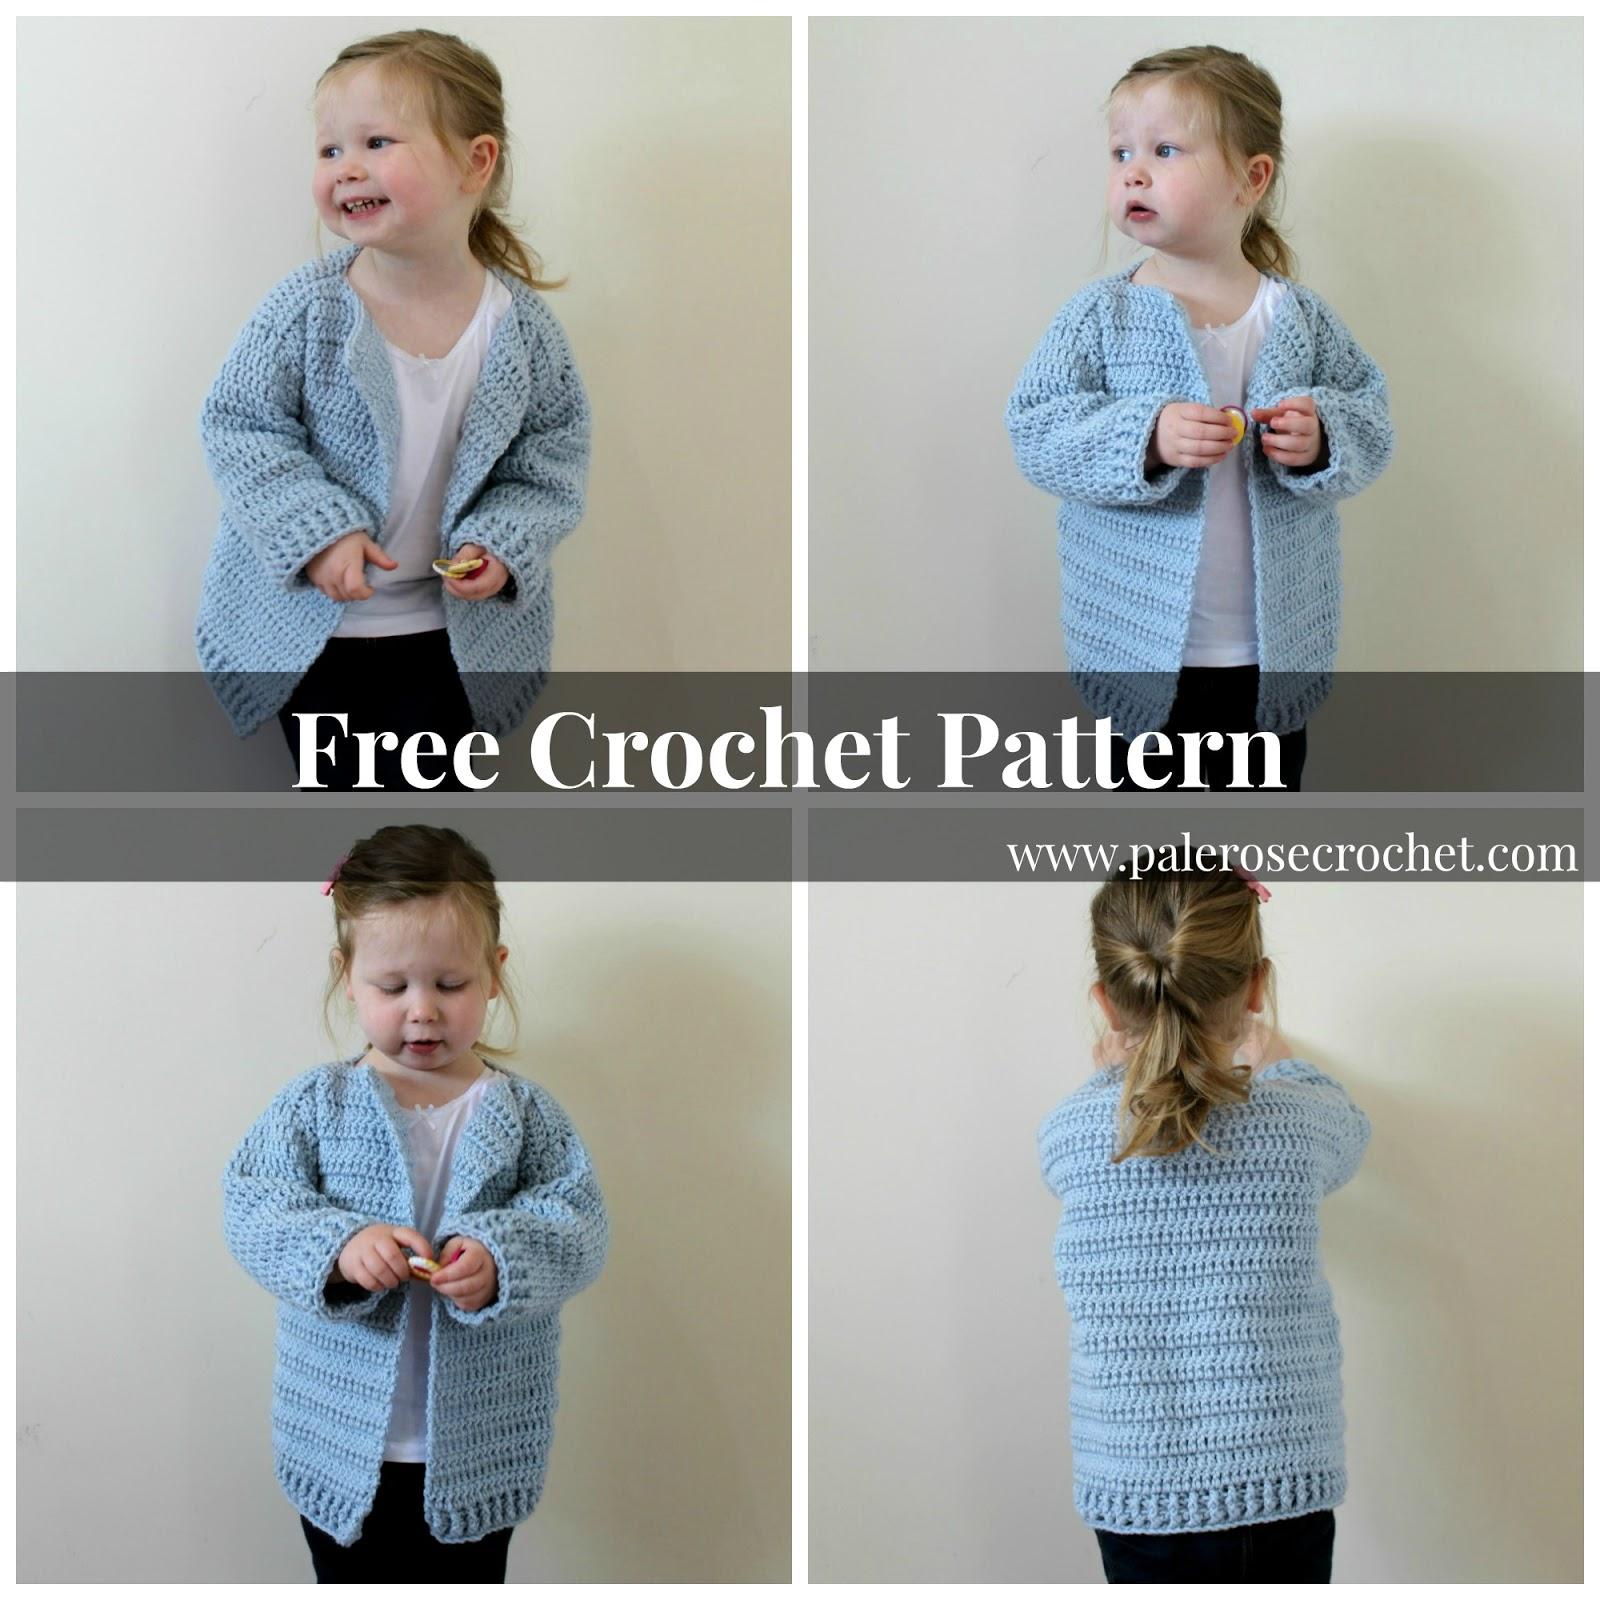 Crochet Patterns Galore Oversized Toddler Cardigan